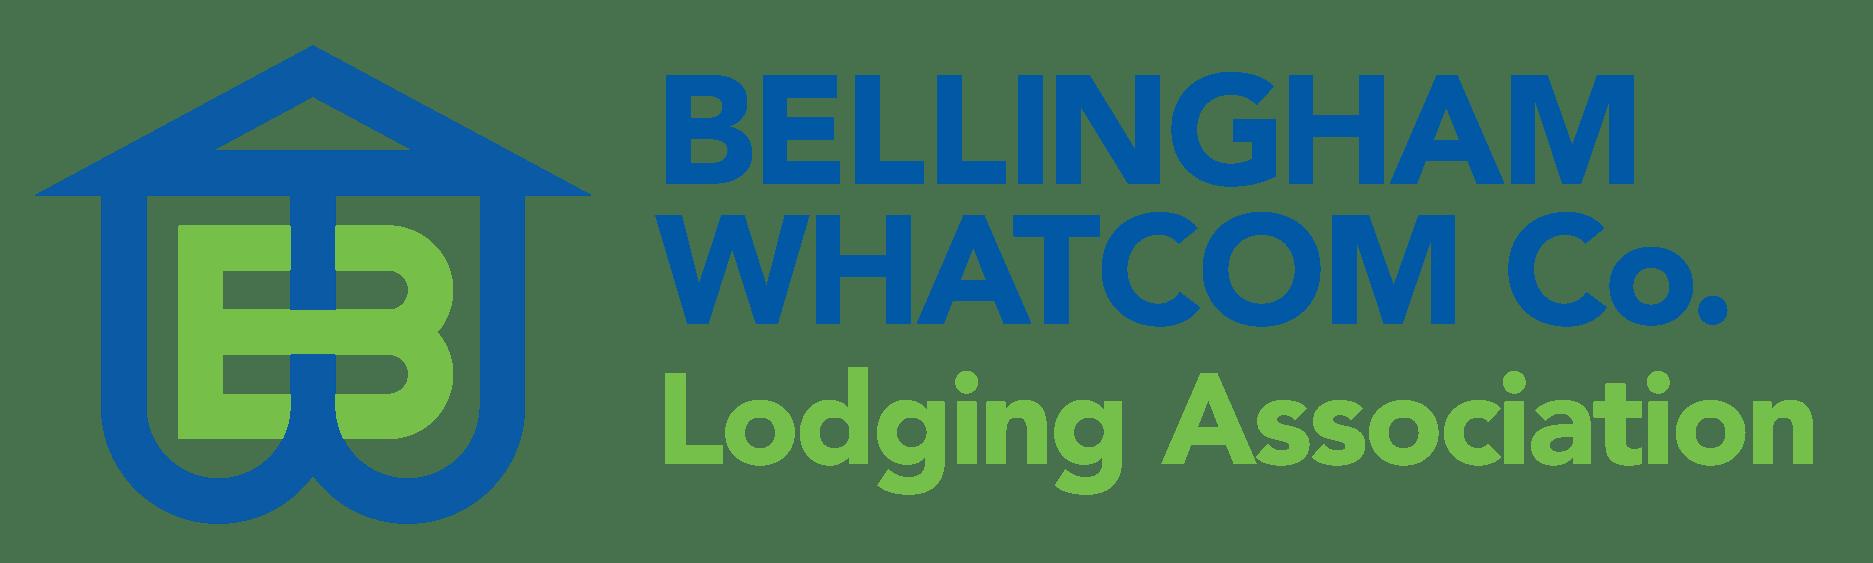 Whatcom Lodging